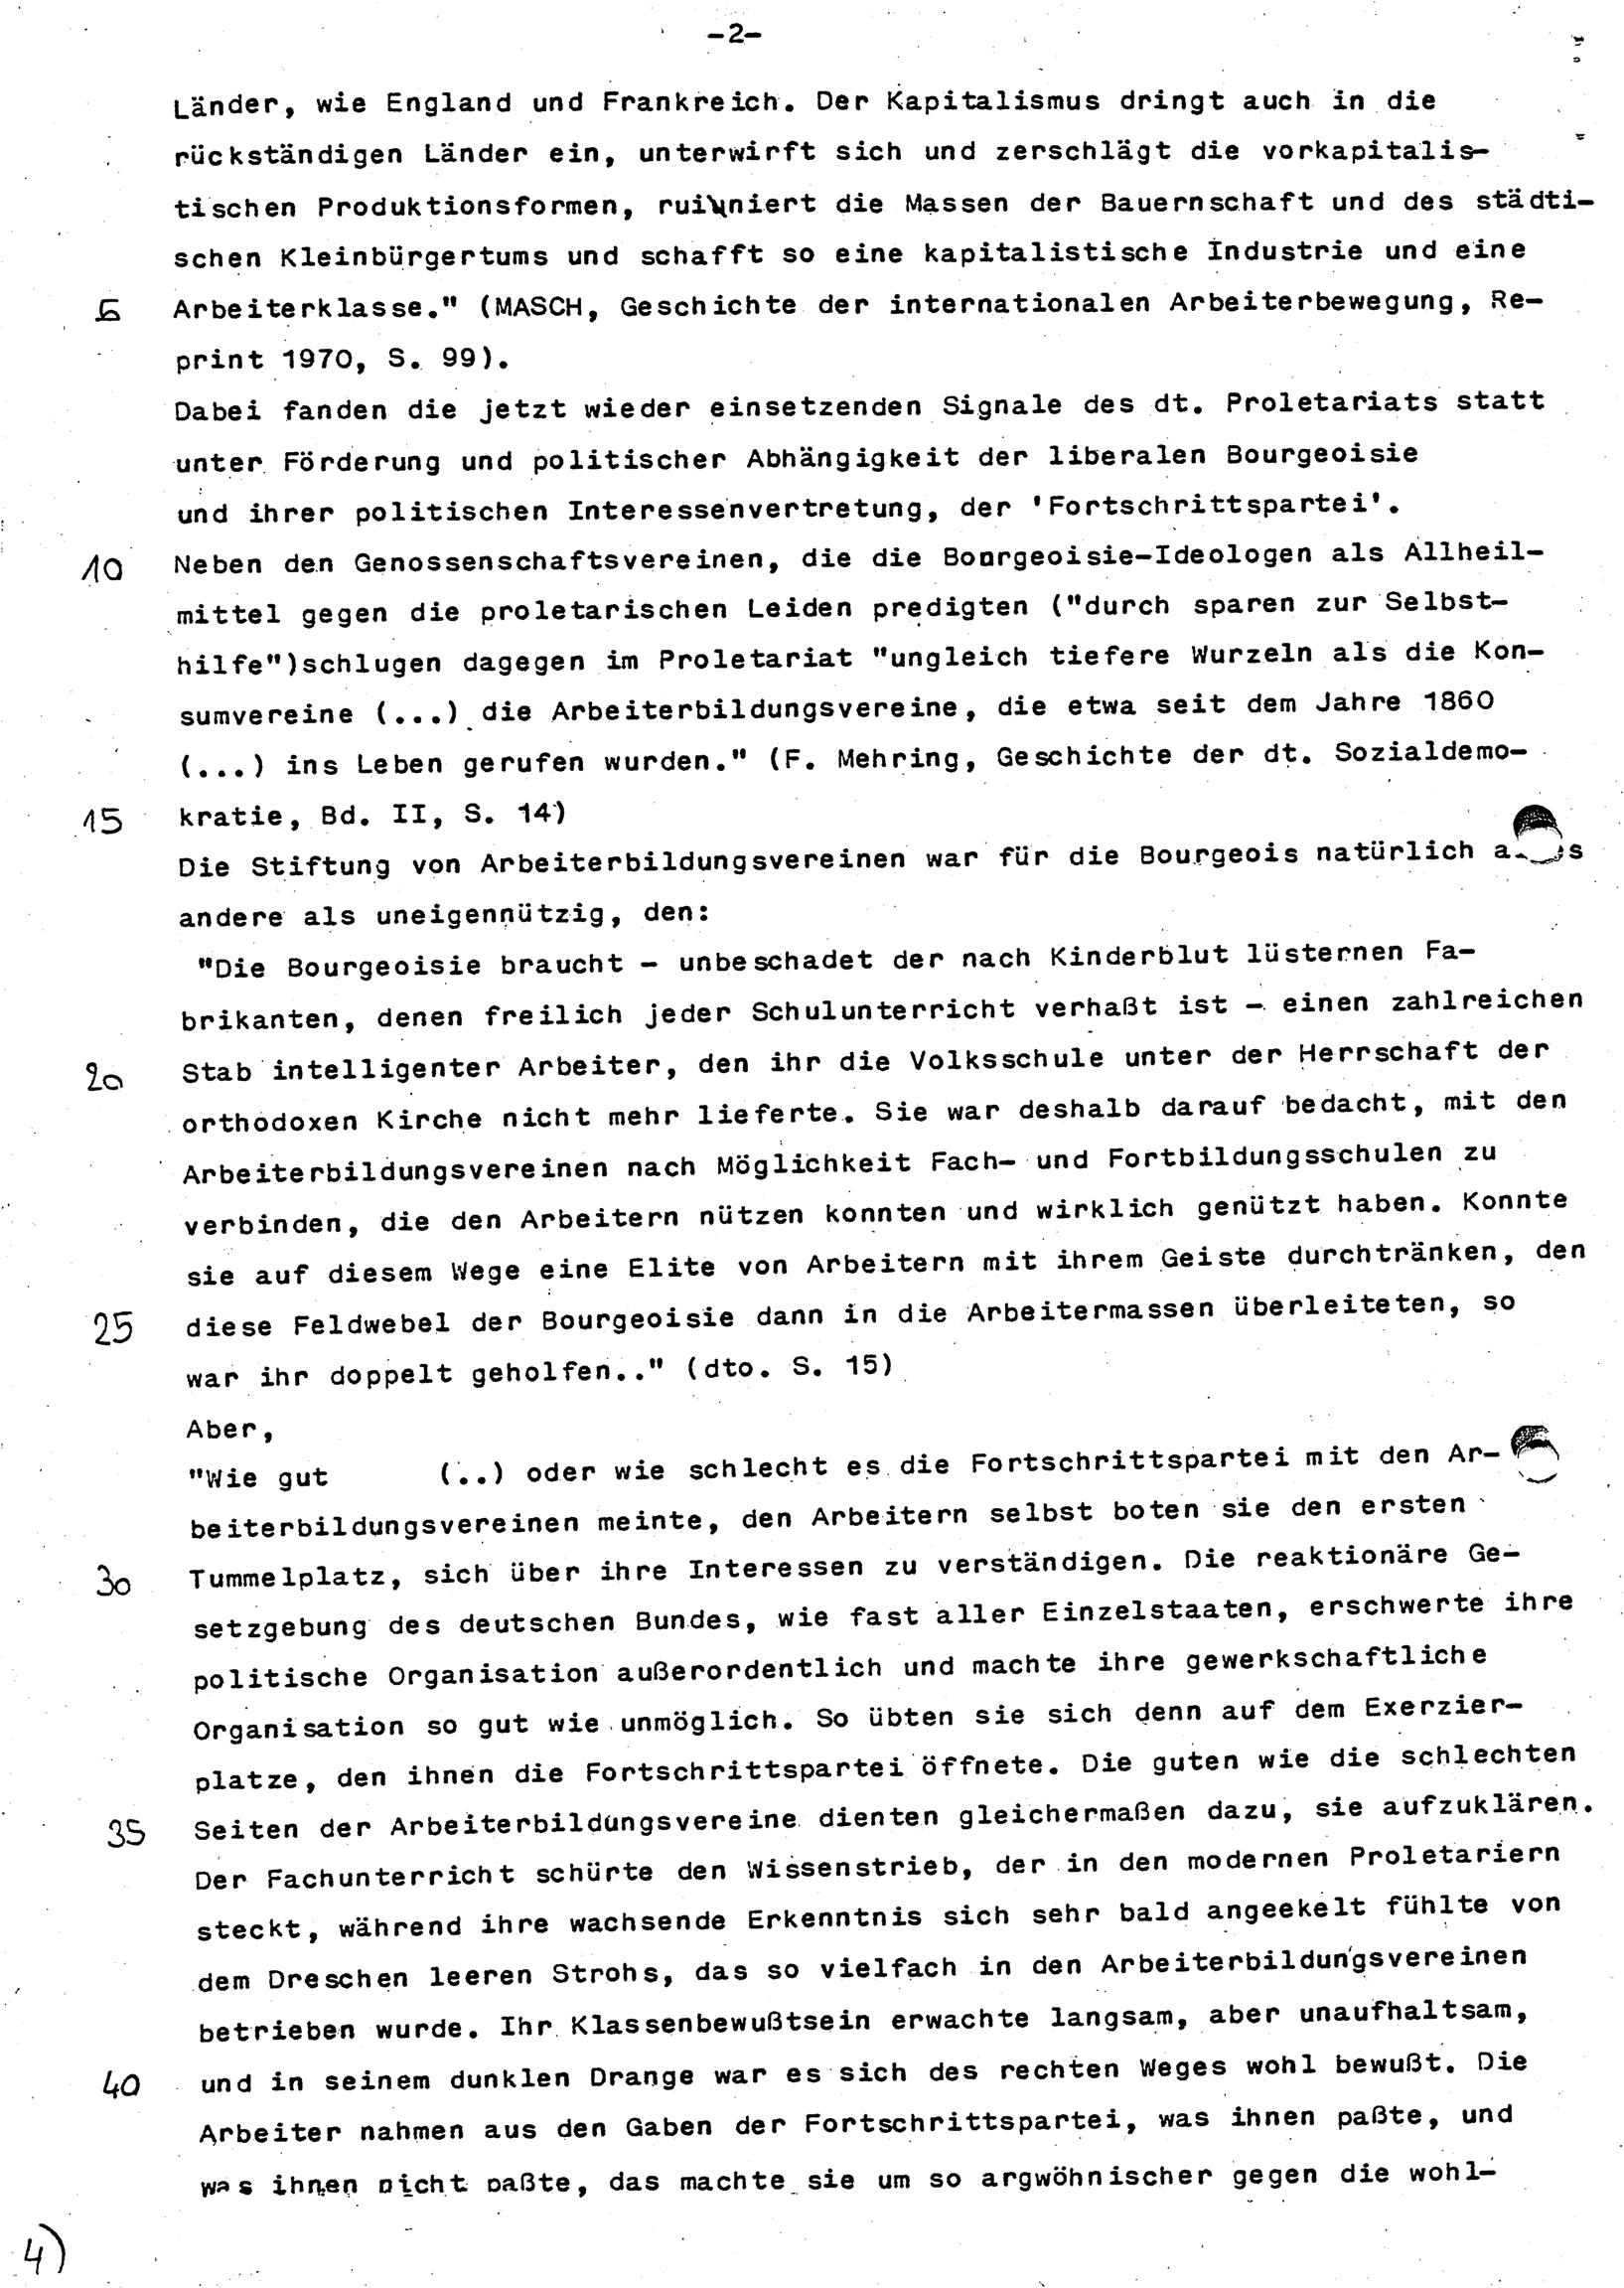 Ulm_KGU_Arbeitsheft_19830425_015_007